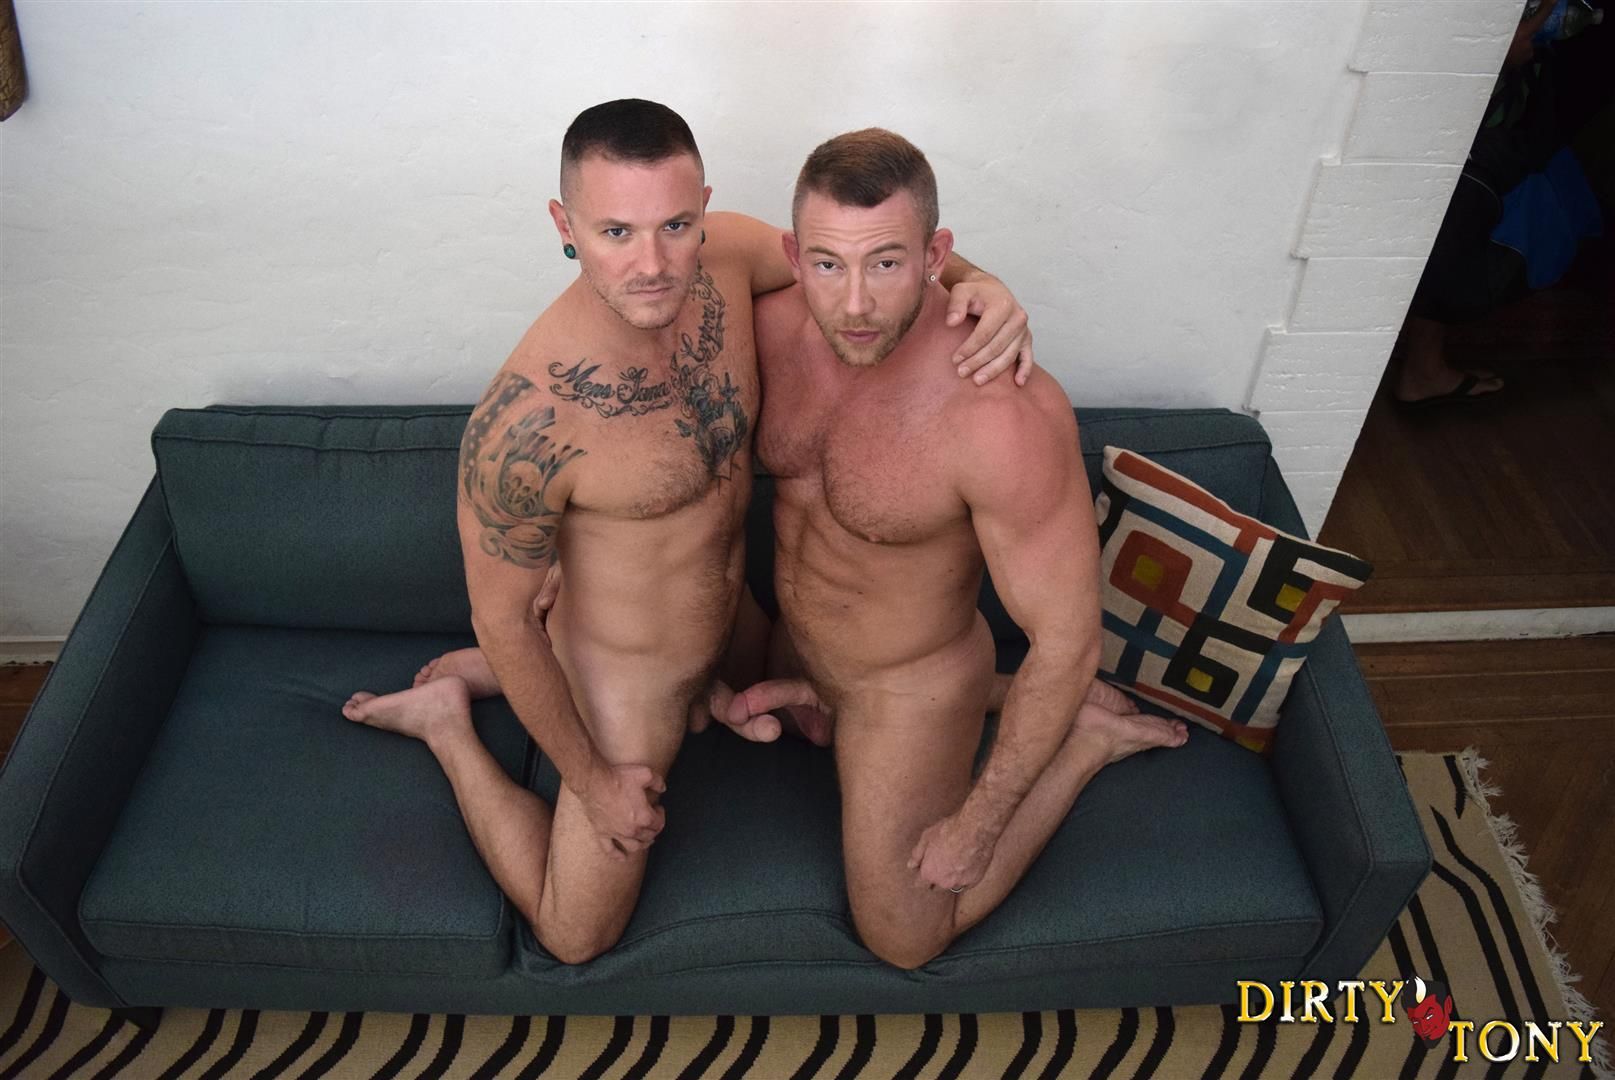 Dirty-Tony-Shay-Michaels-and-Max-Cameron-Hairy-Muscle-Hunk-Bareback-Amateur-Gay-Porn-01.jpg